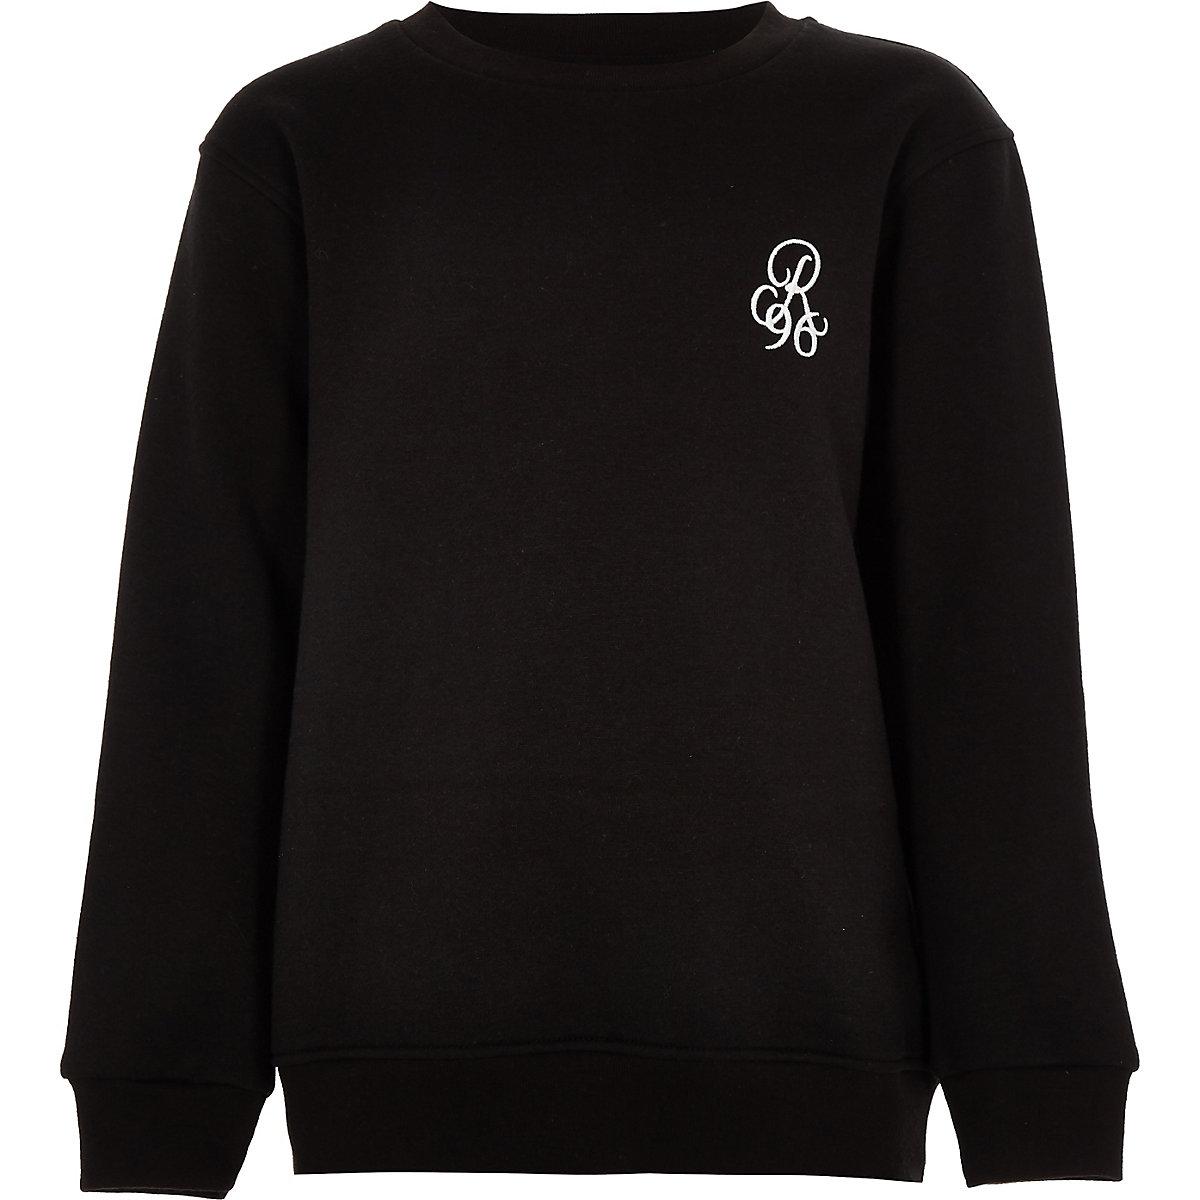 "Schwarzes Sweatshirt ""R96"""